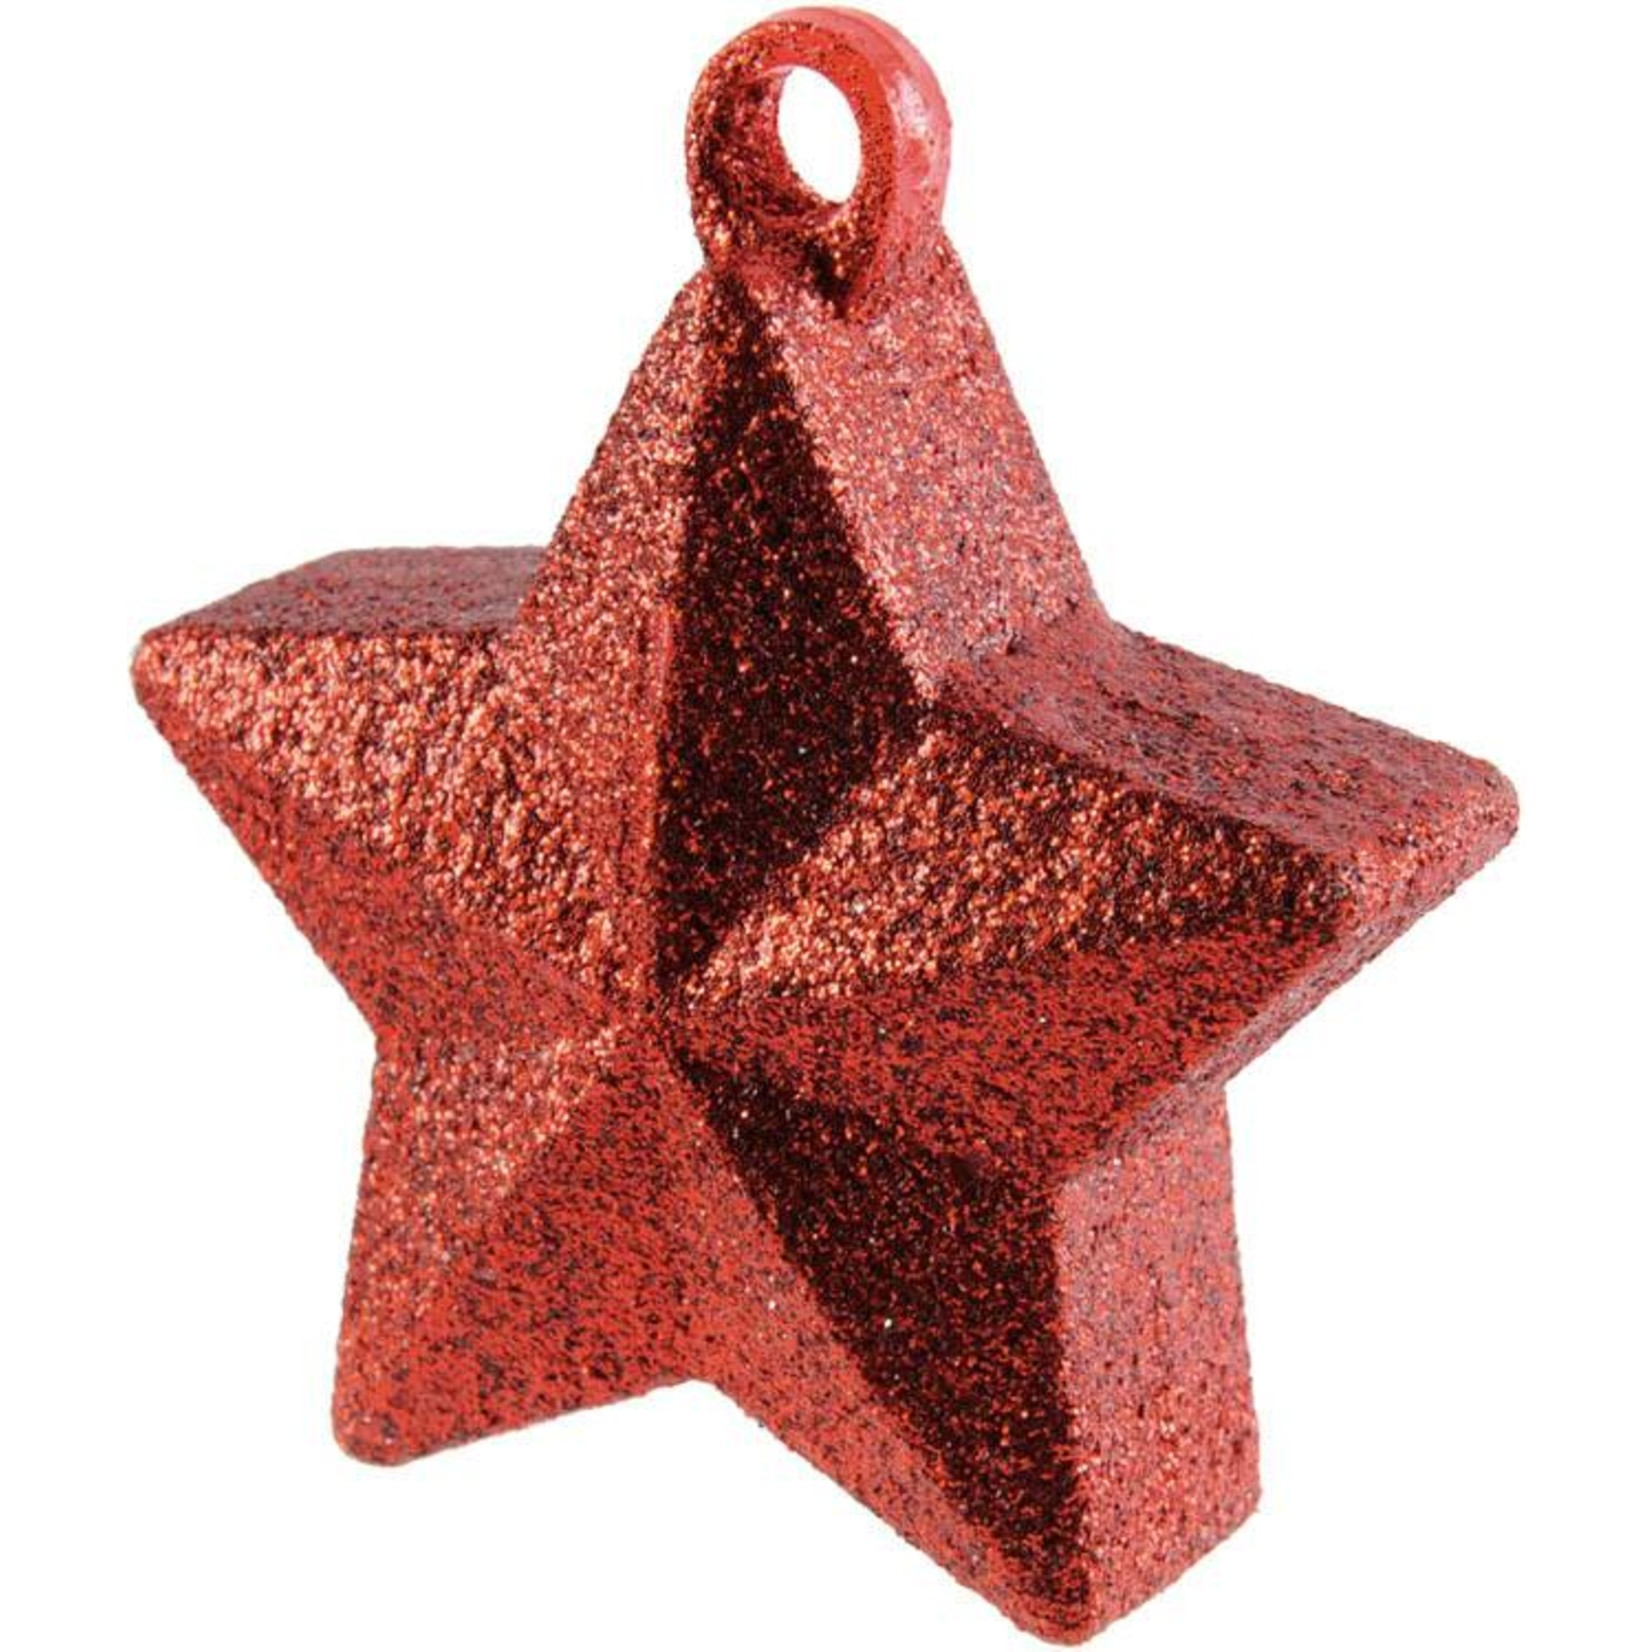 Balloon Weight-Glitter Star-Red-6oz